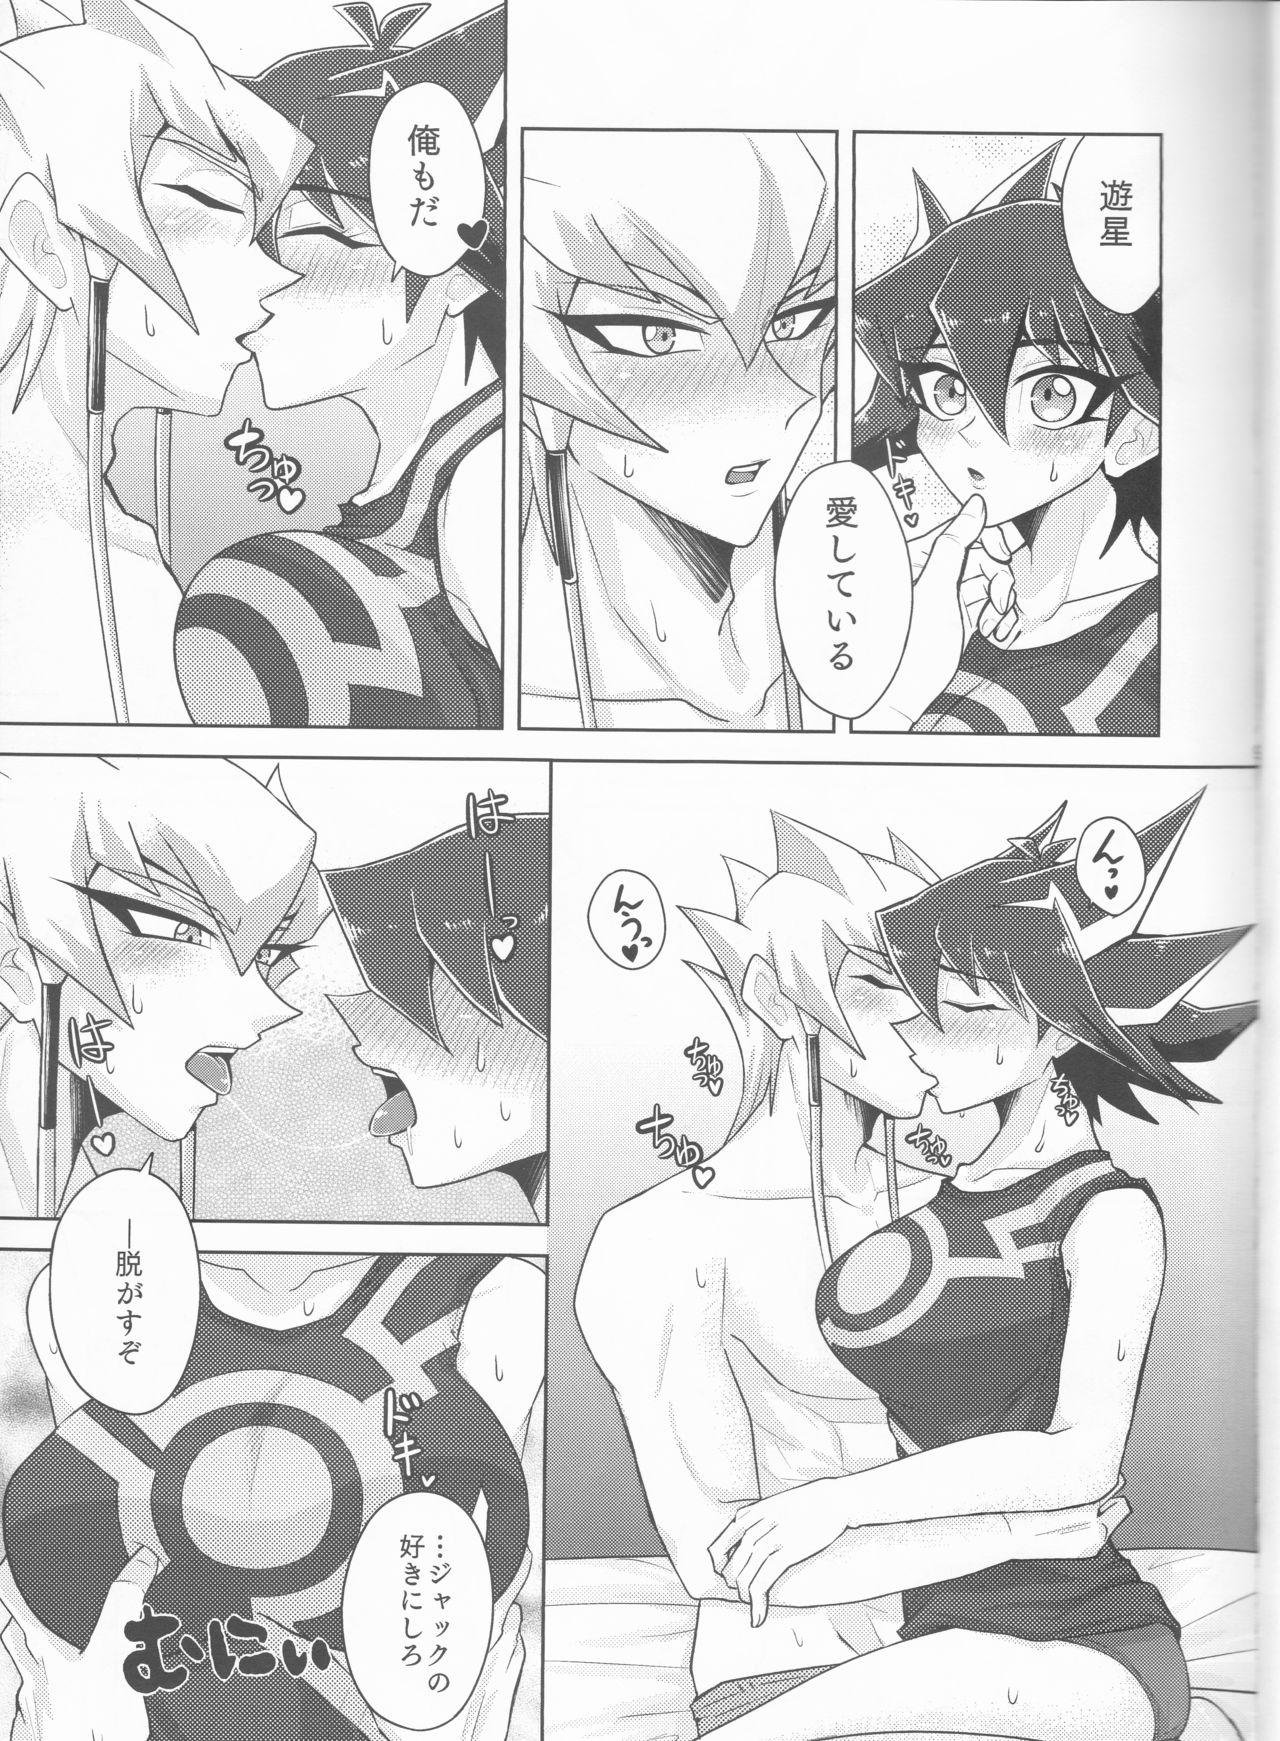 (Chou Ore no Turn 2019) [KINOPOTION (Take Nameko)] King (Mi) to Yusei-chan ♀ (Yu-Gi-Oh! 5D's) 8